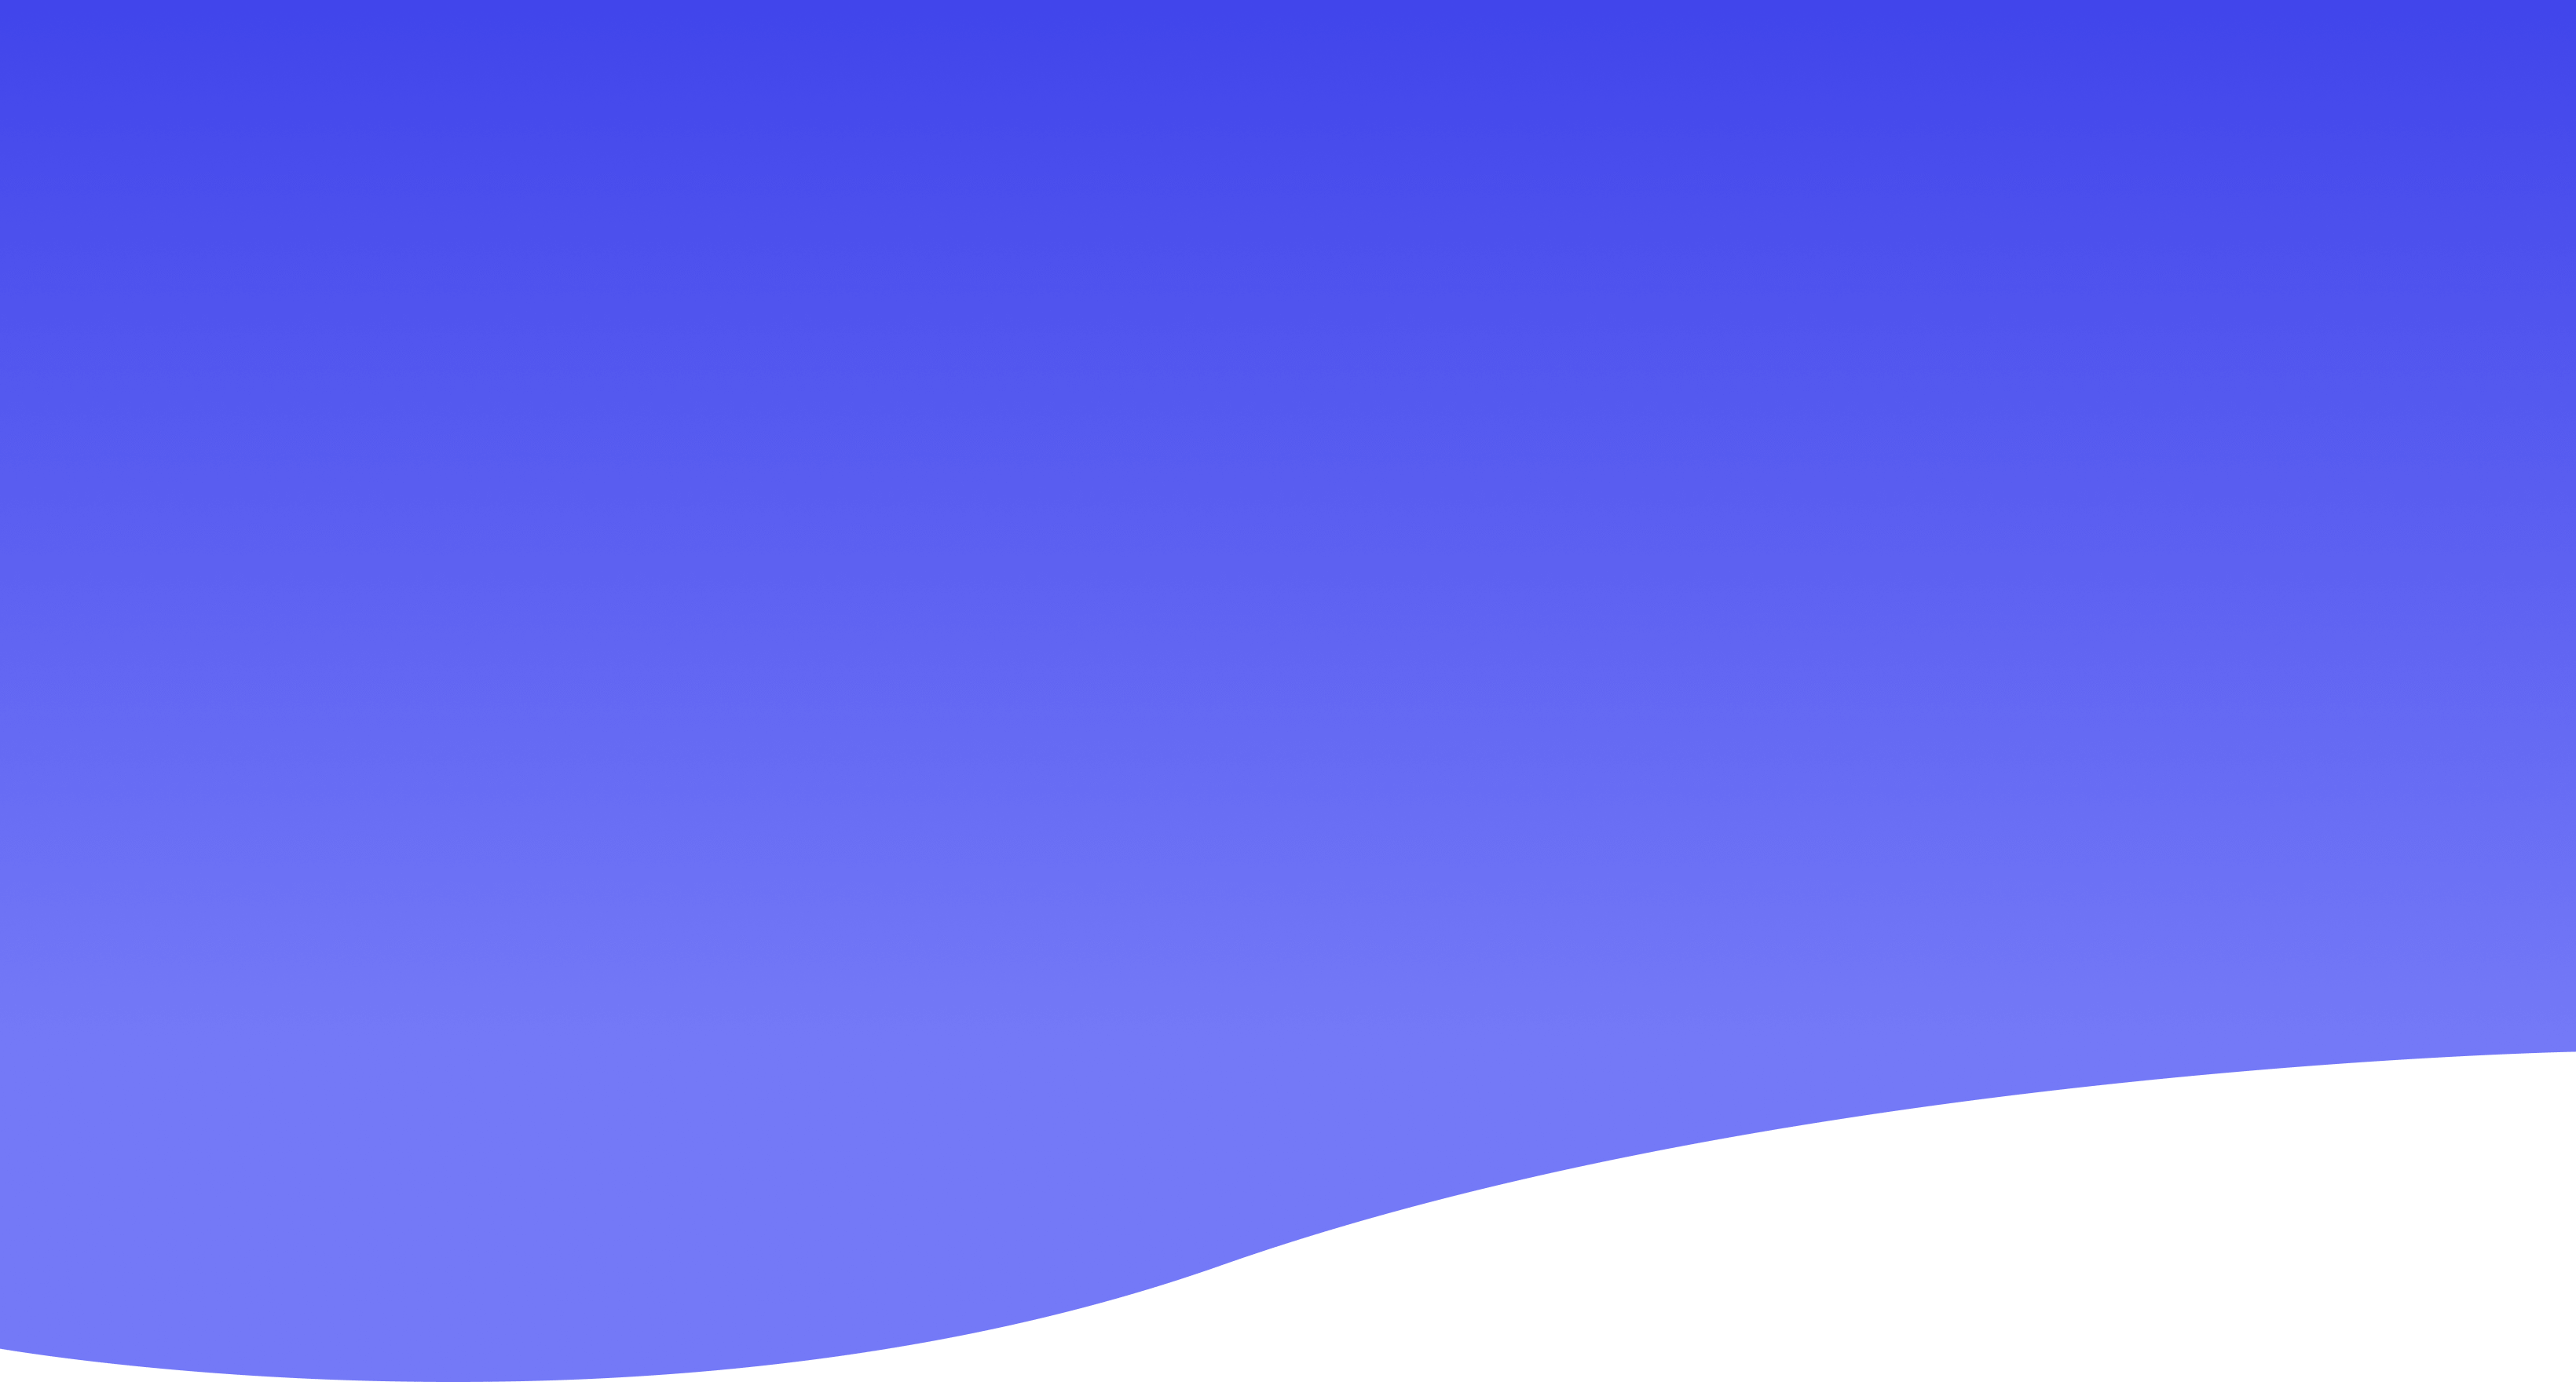 bg-02